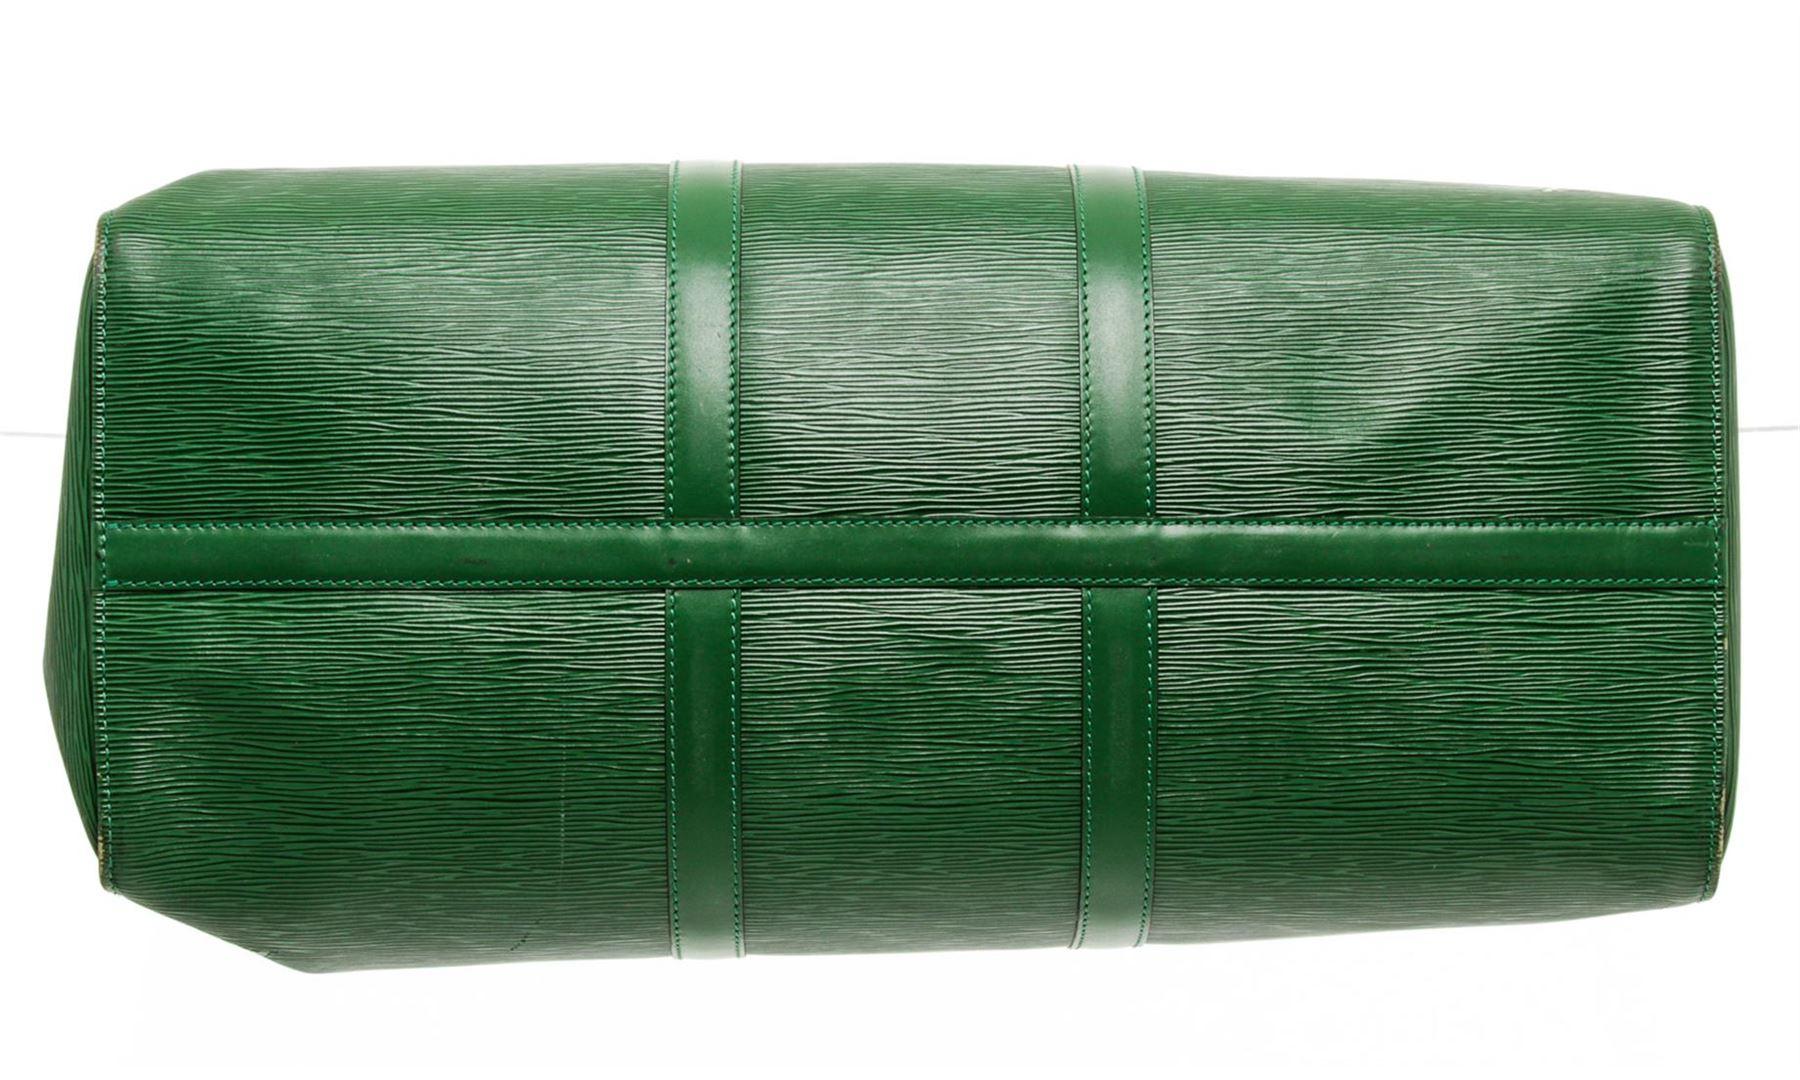 d028dd32f12 Louis Vuitton Green Epi Leather Keepall 55 cm Duffle Bag Luggage